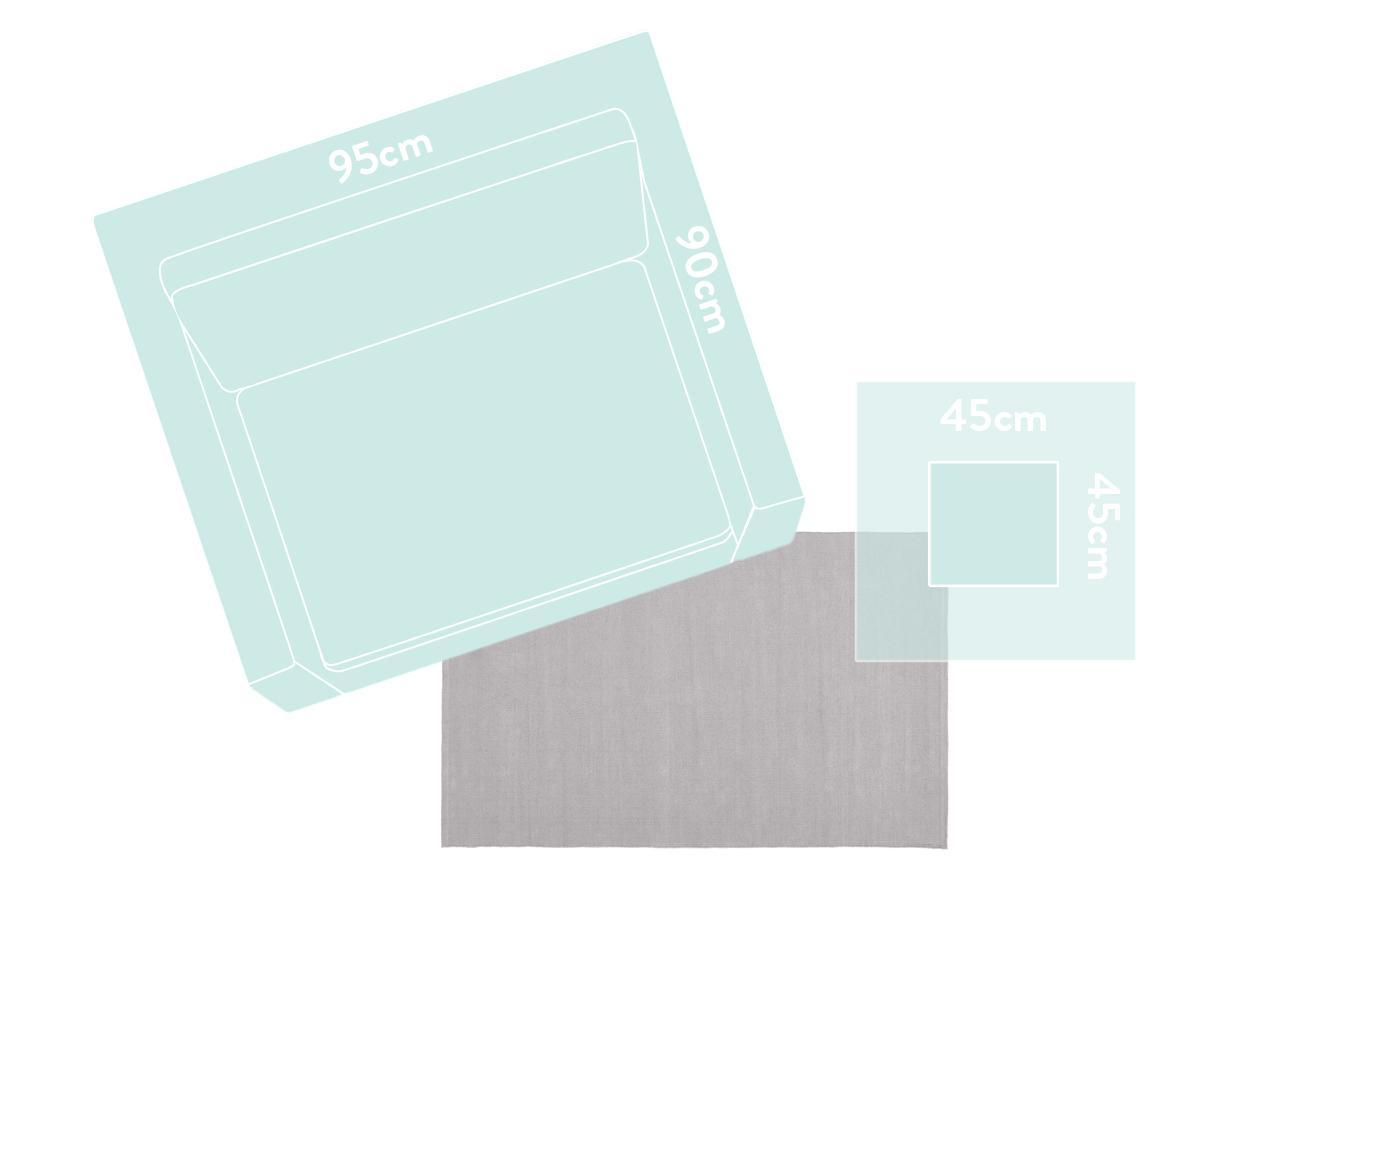 Dünner Baumwollteppich Agneta, handgewebt, 100% Baumwolle, Grau, B 70 x L 140 cm (Größe XS)